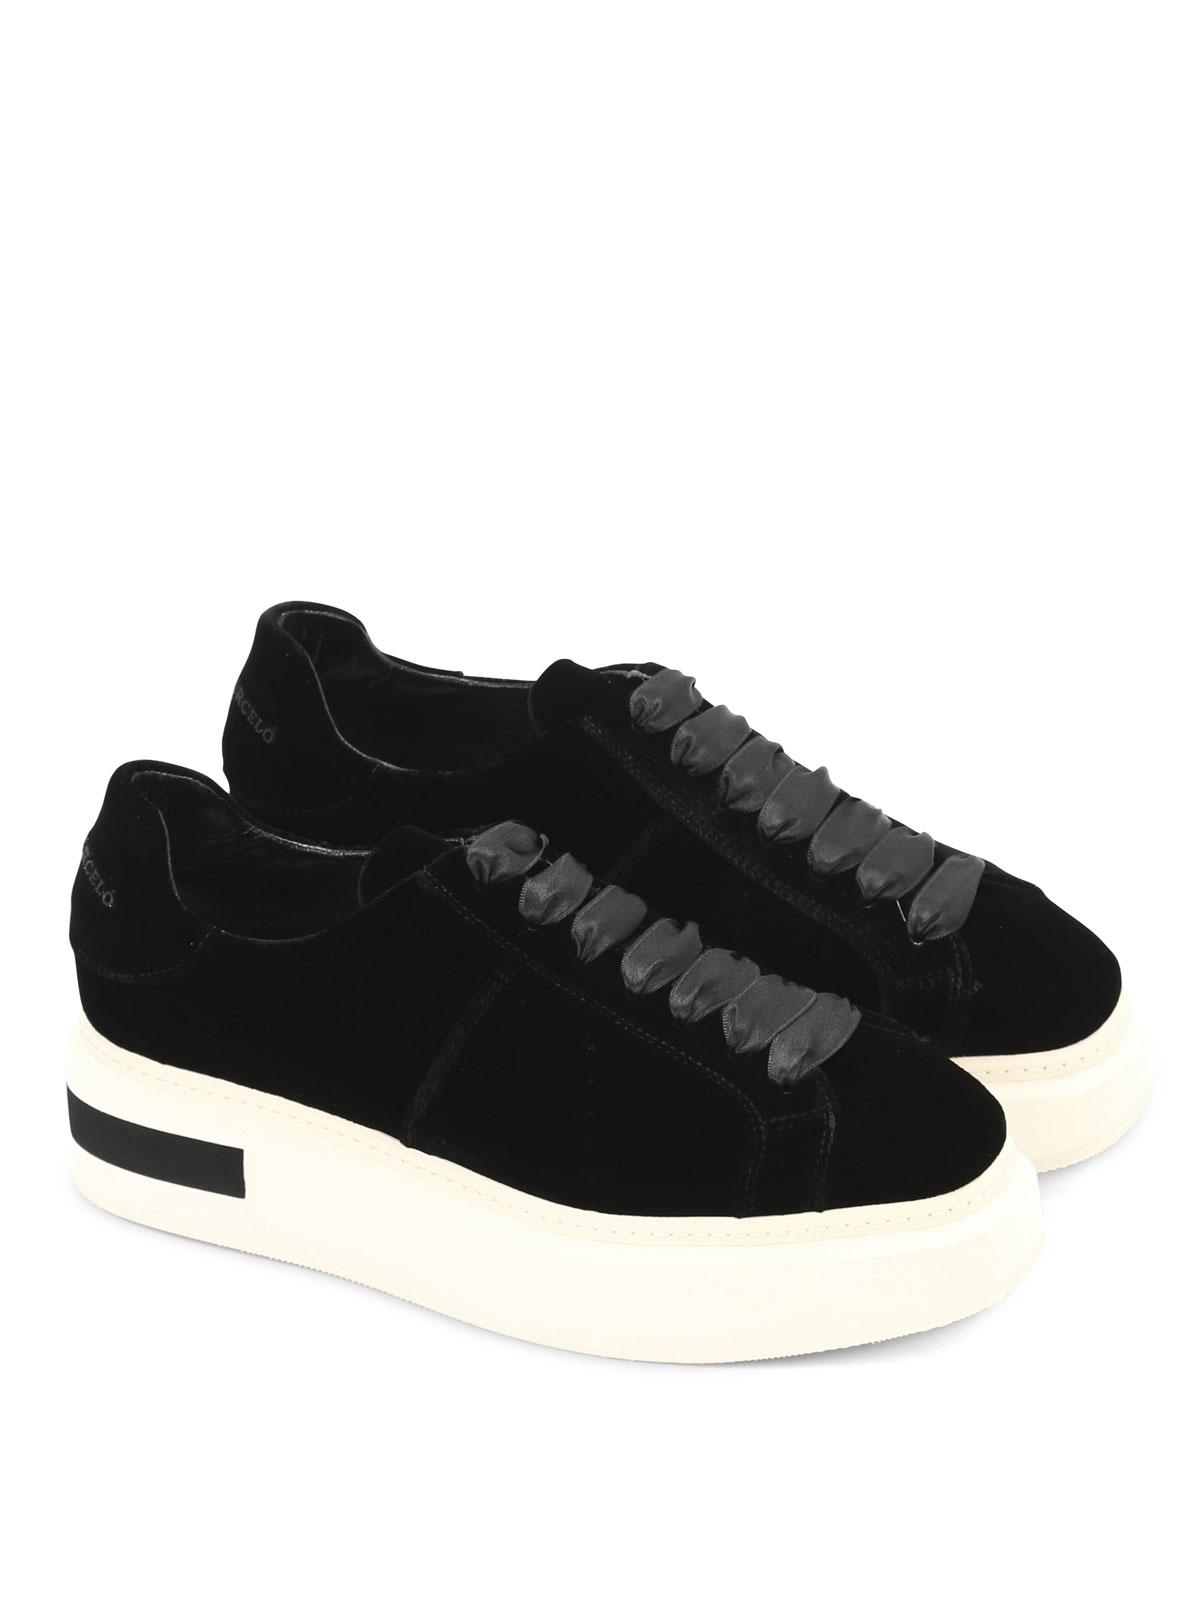 Buy Cheap Brand New Unisex Discount How Much Manuel Barcelò Velvet Sneaker CCZSoOFWh